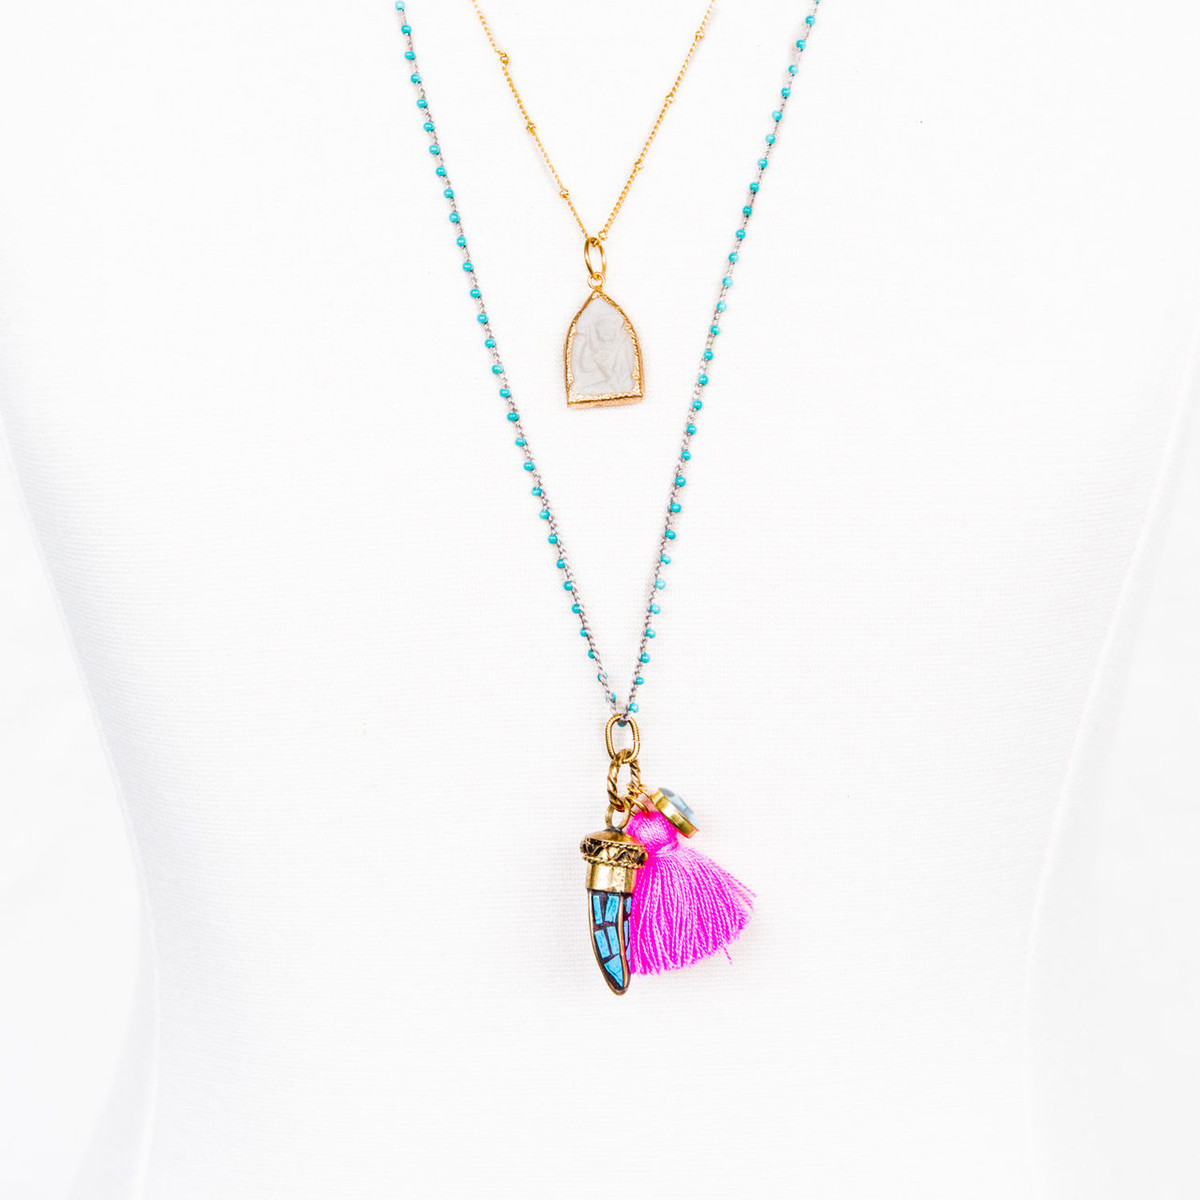 7Stitches White Buddha and chain Necklace